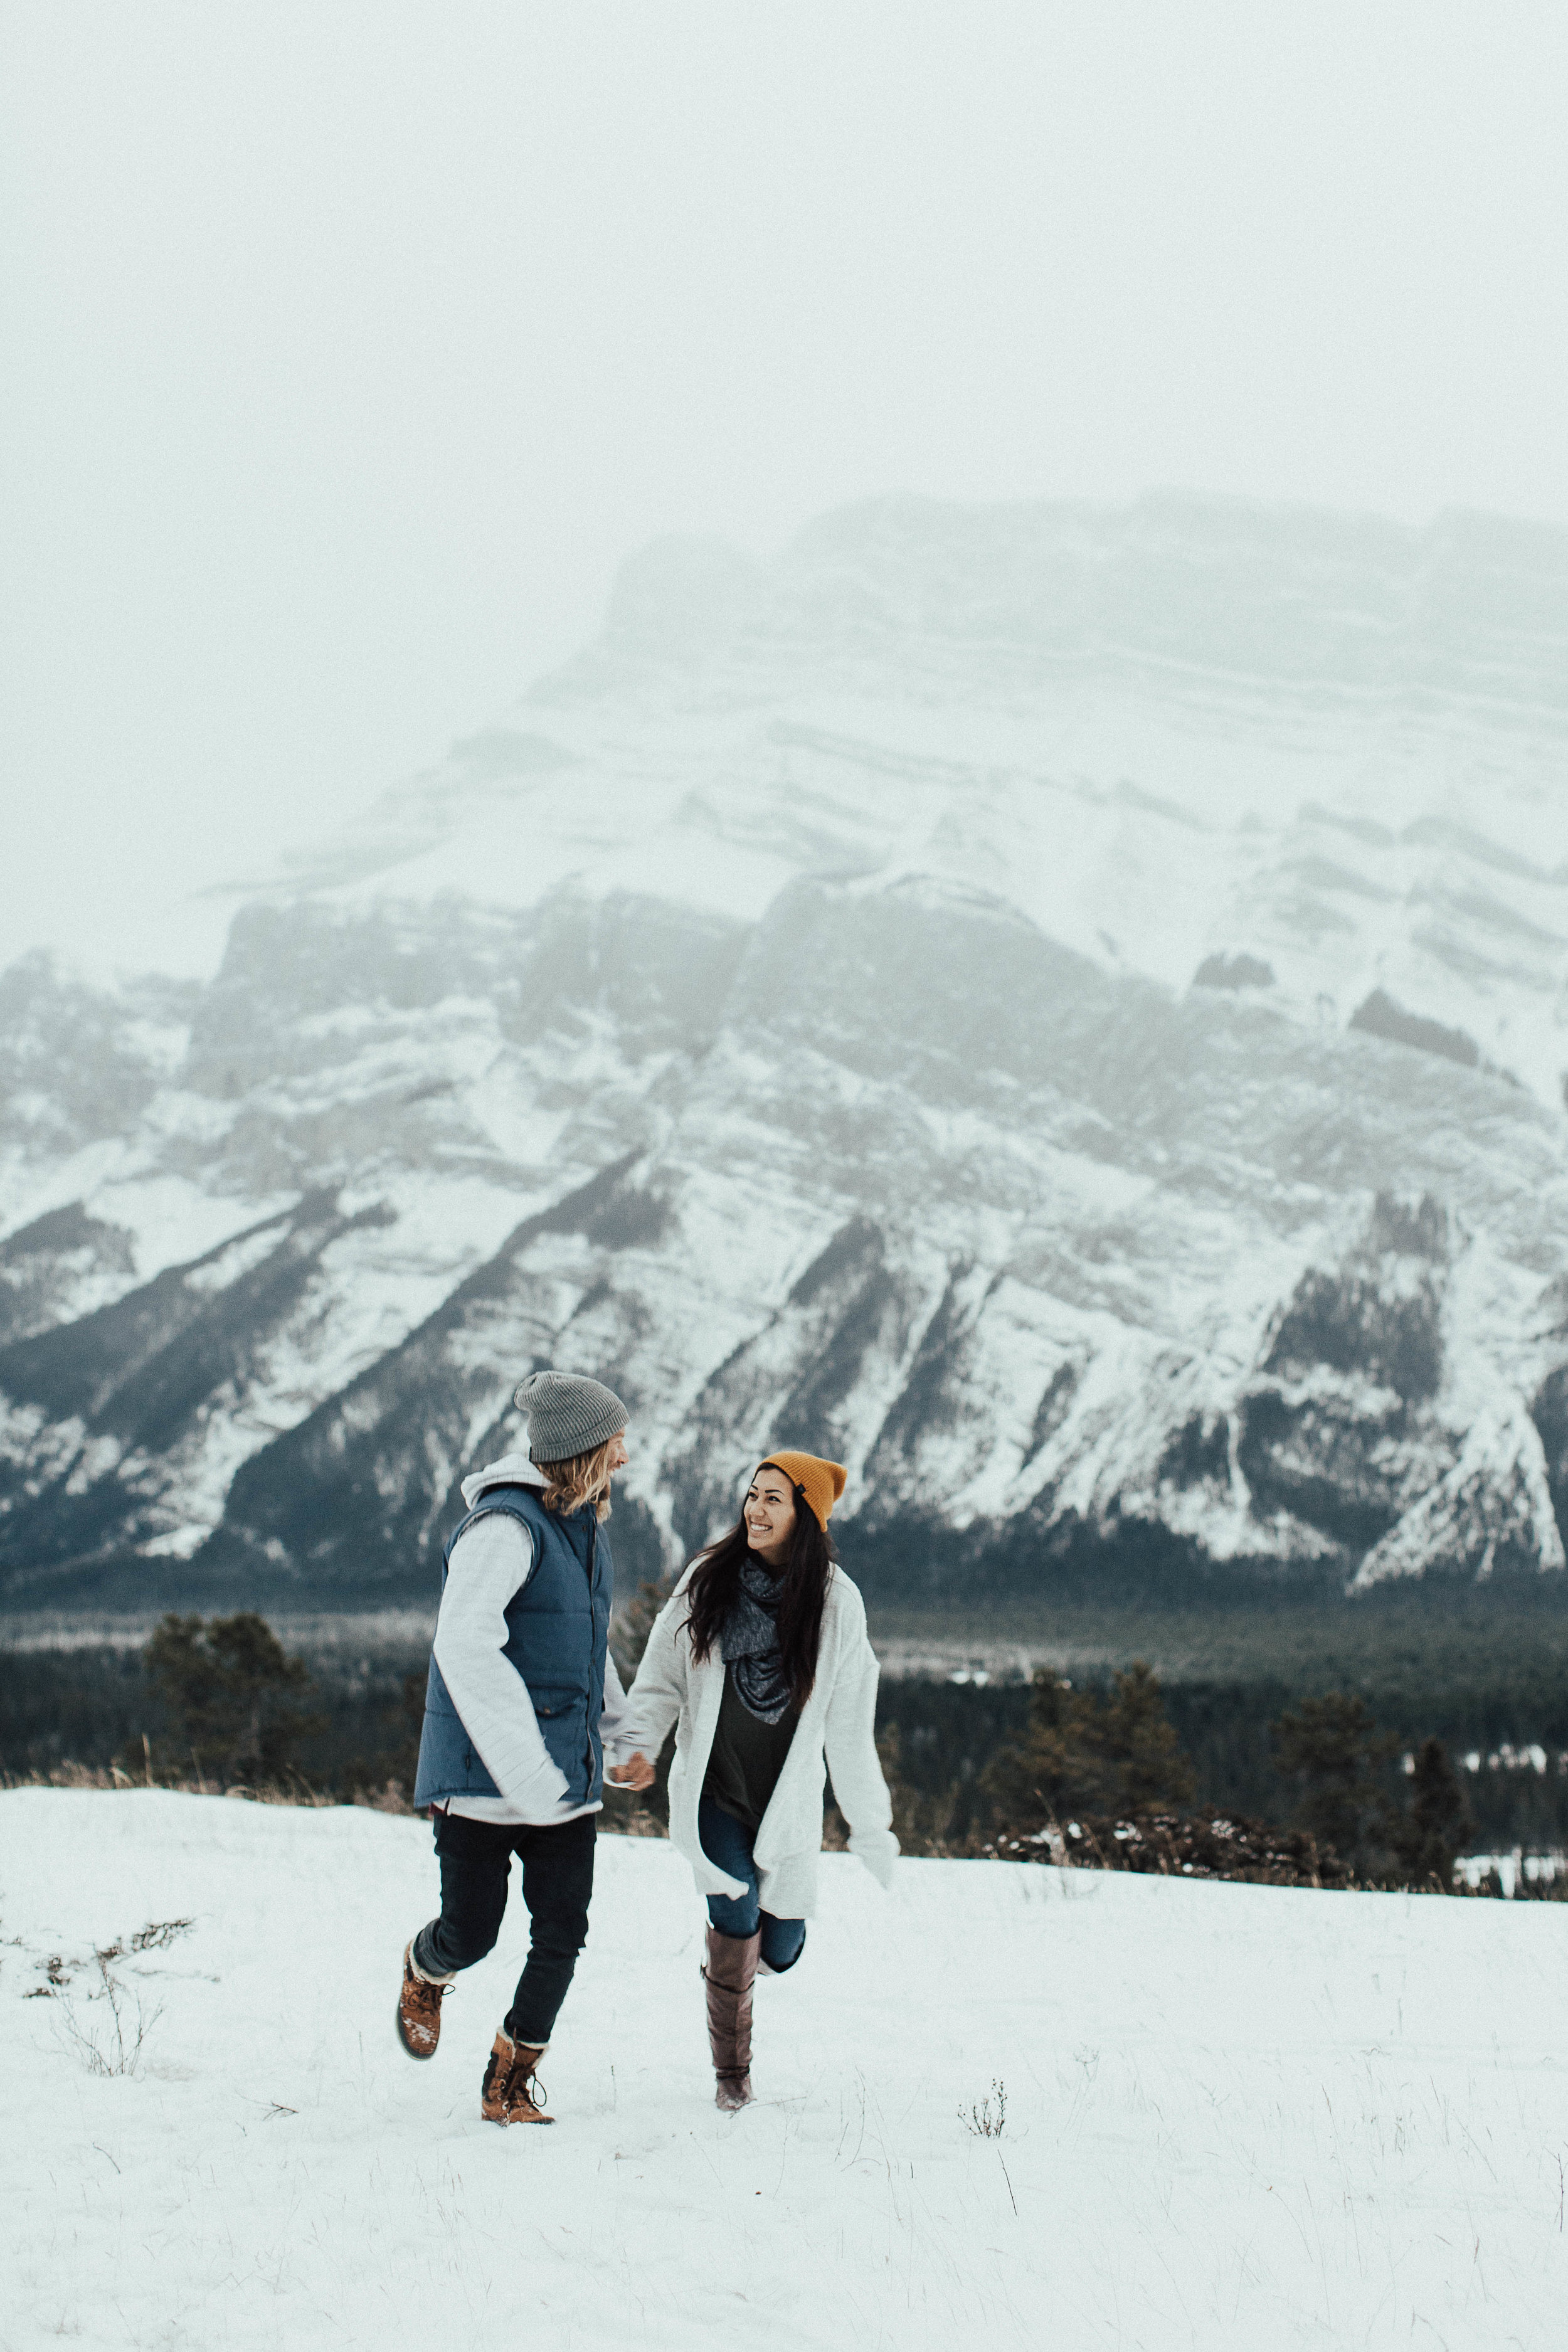 Banff Engagement Photographer - Winter Mountain Adventure Engagement Session - Michelle Larmand Photography-011